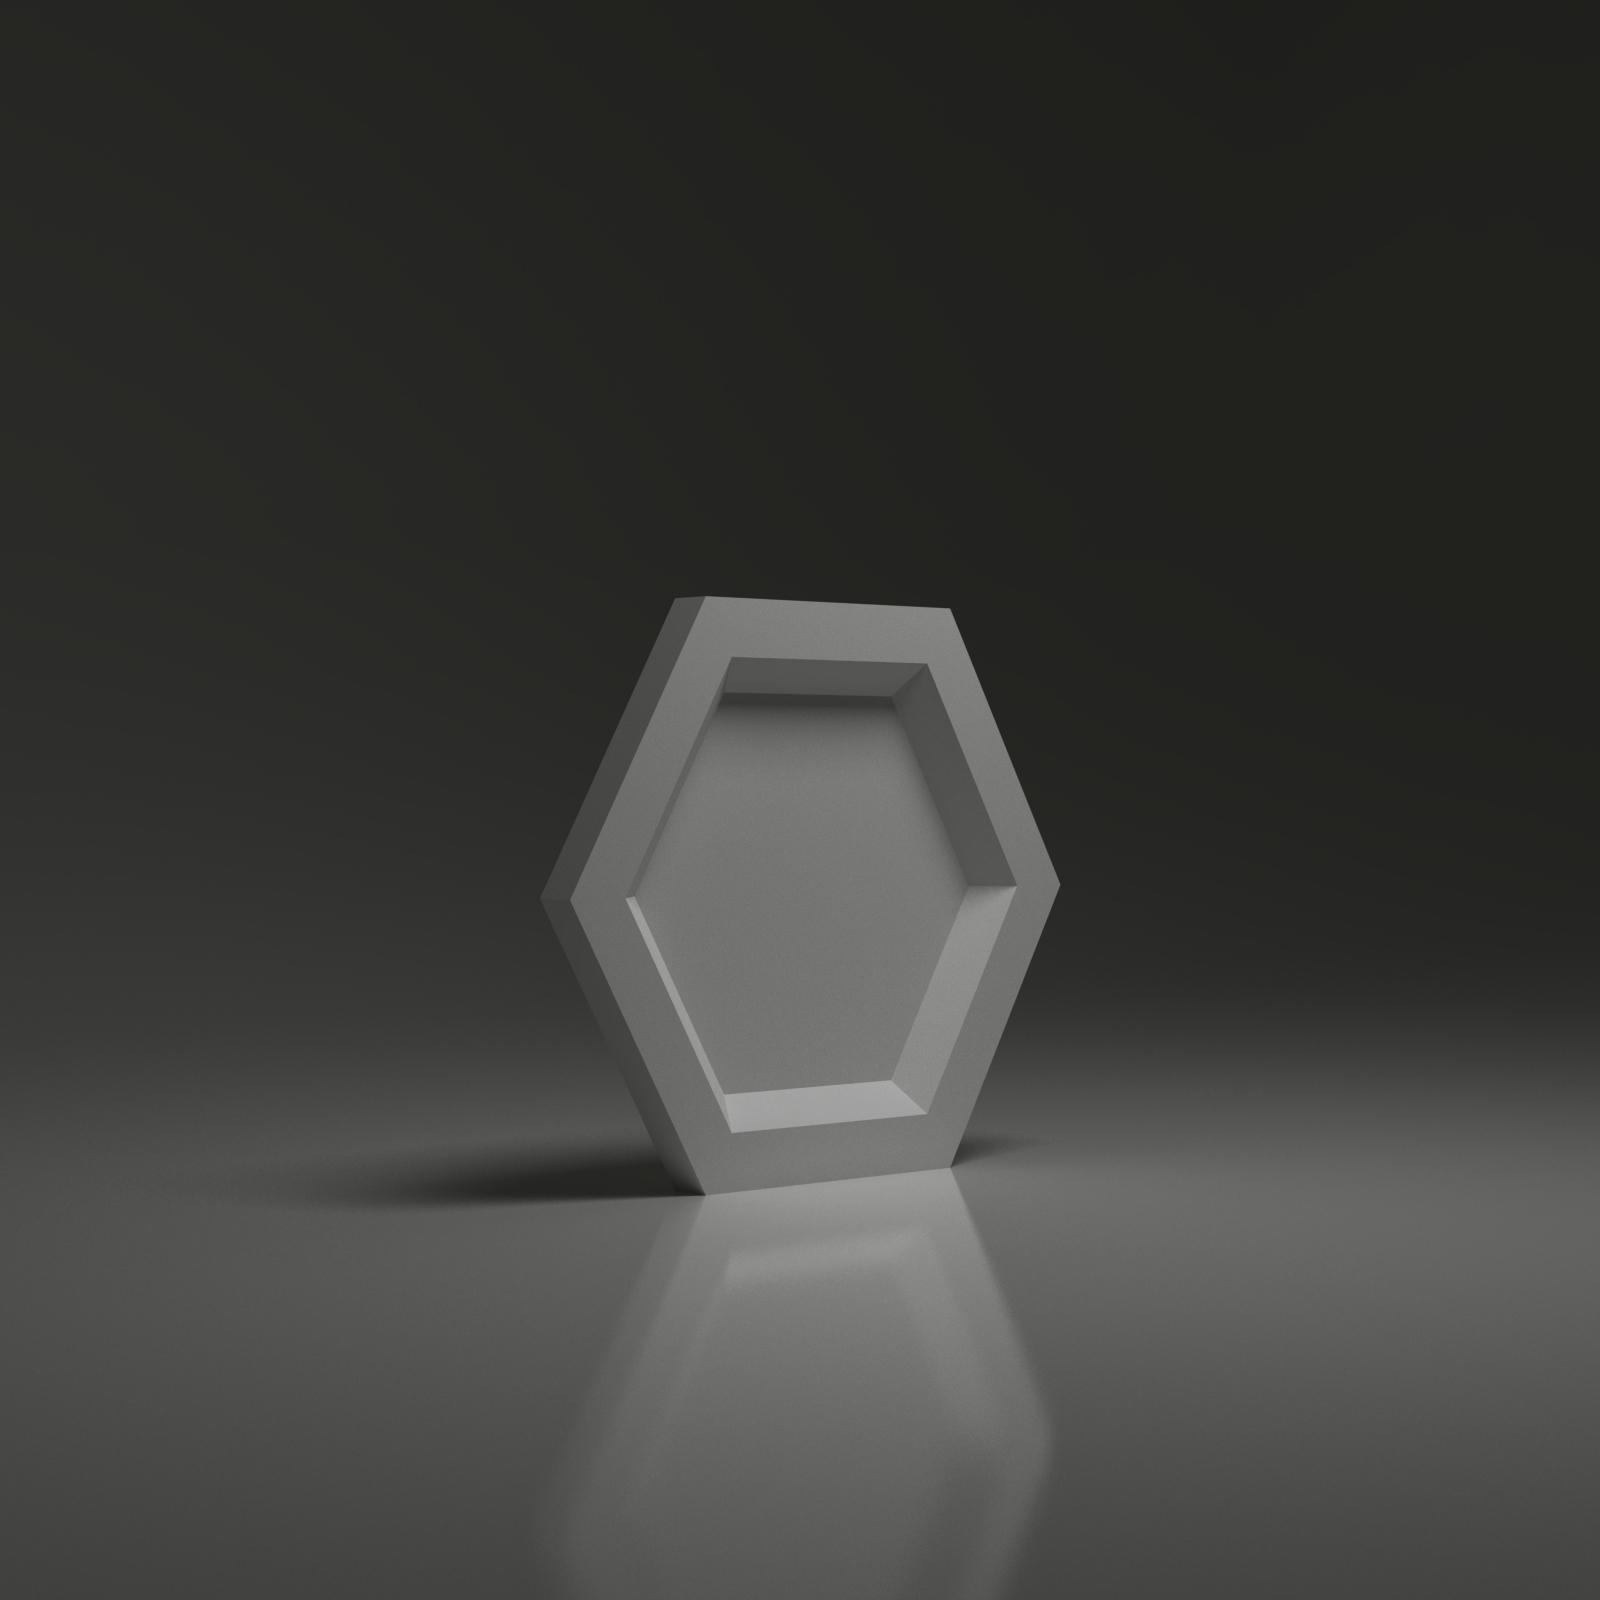 hexagon-slice-wizu